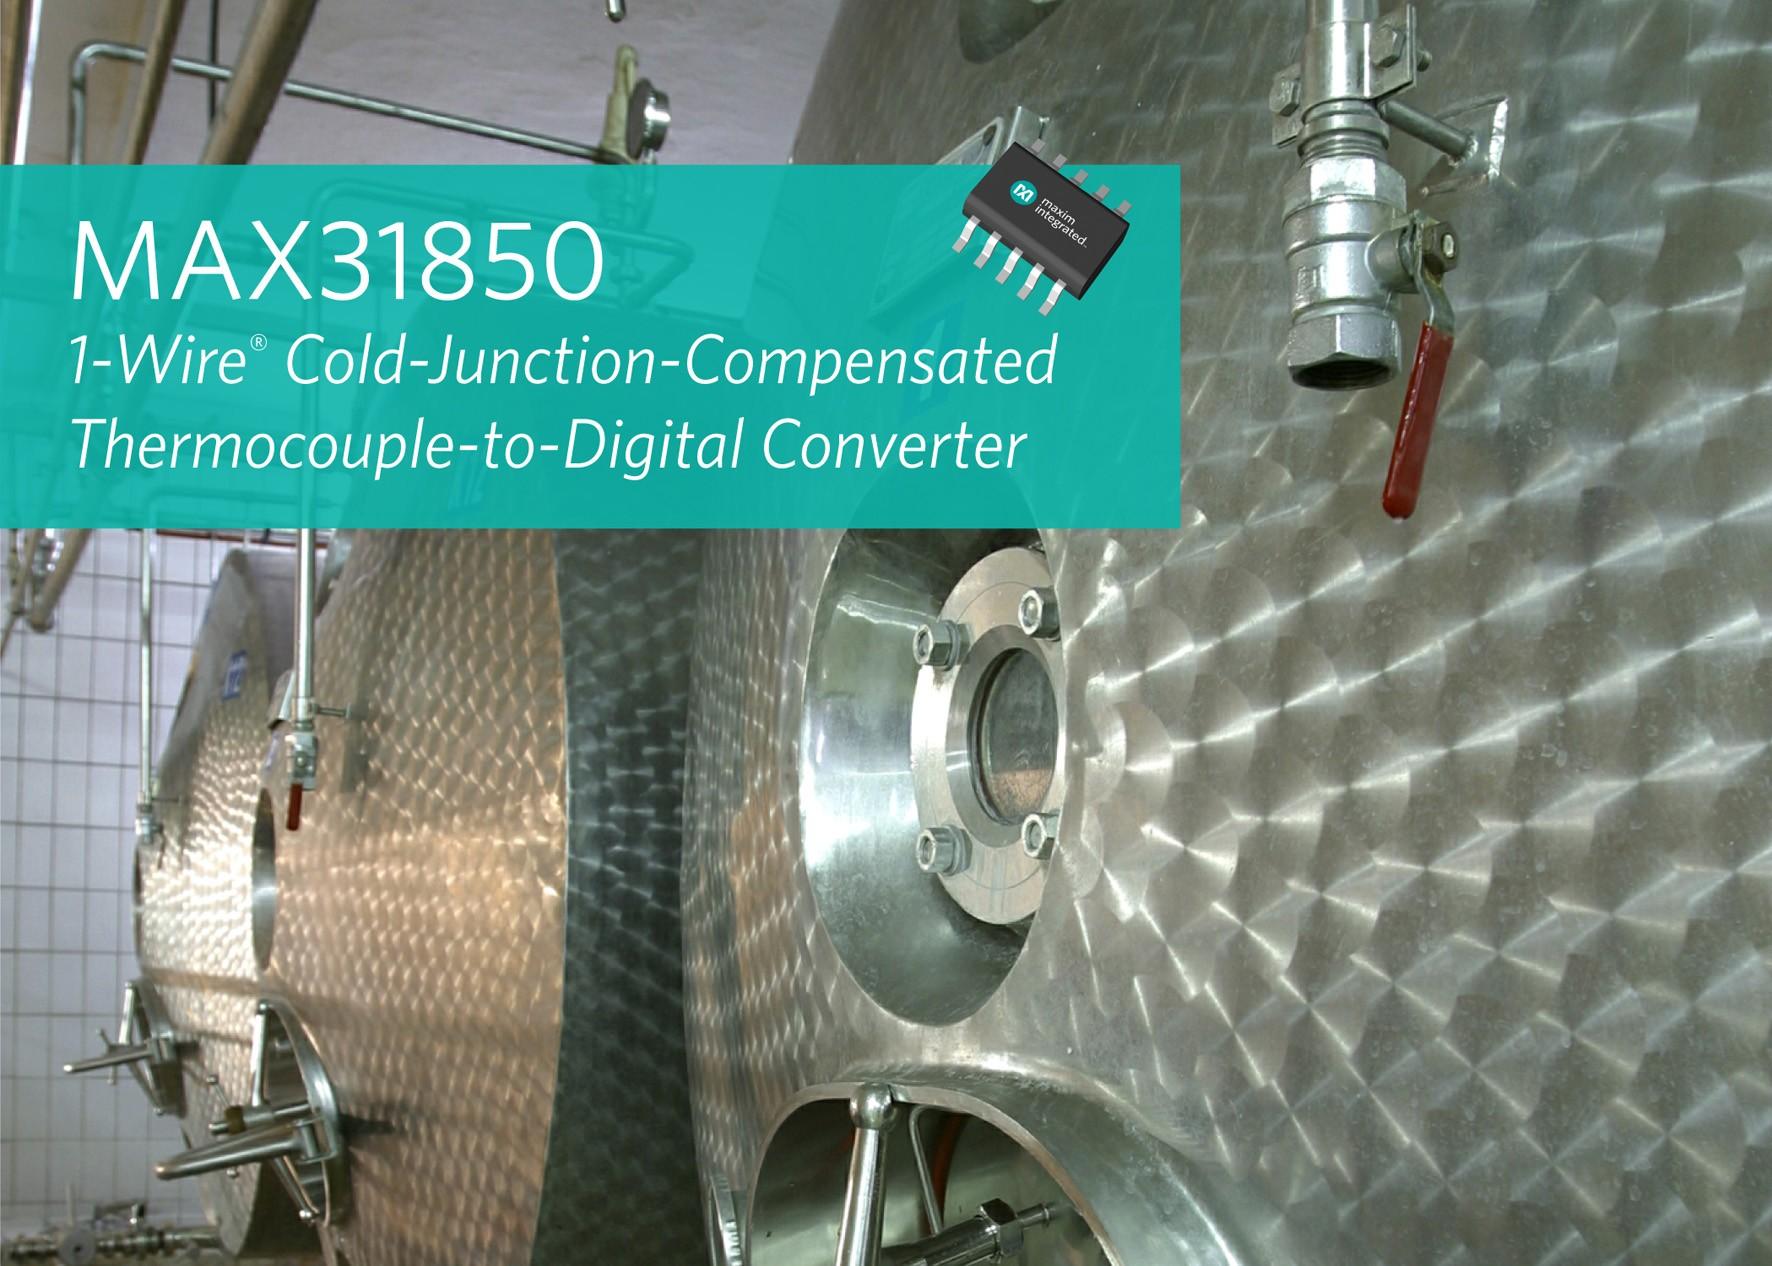 1 Wire Thermocouple to Digital Converters Simplify Multisensor Designs